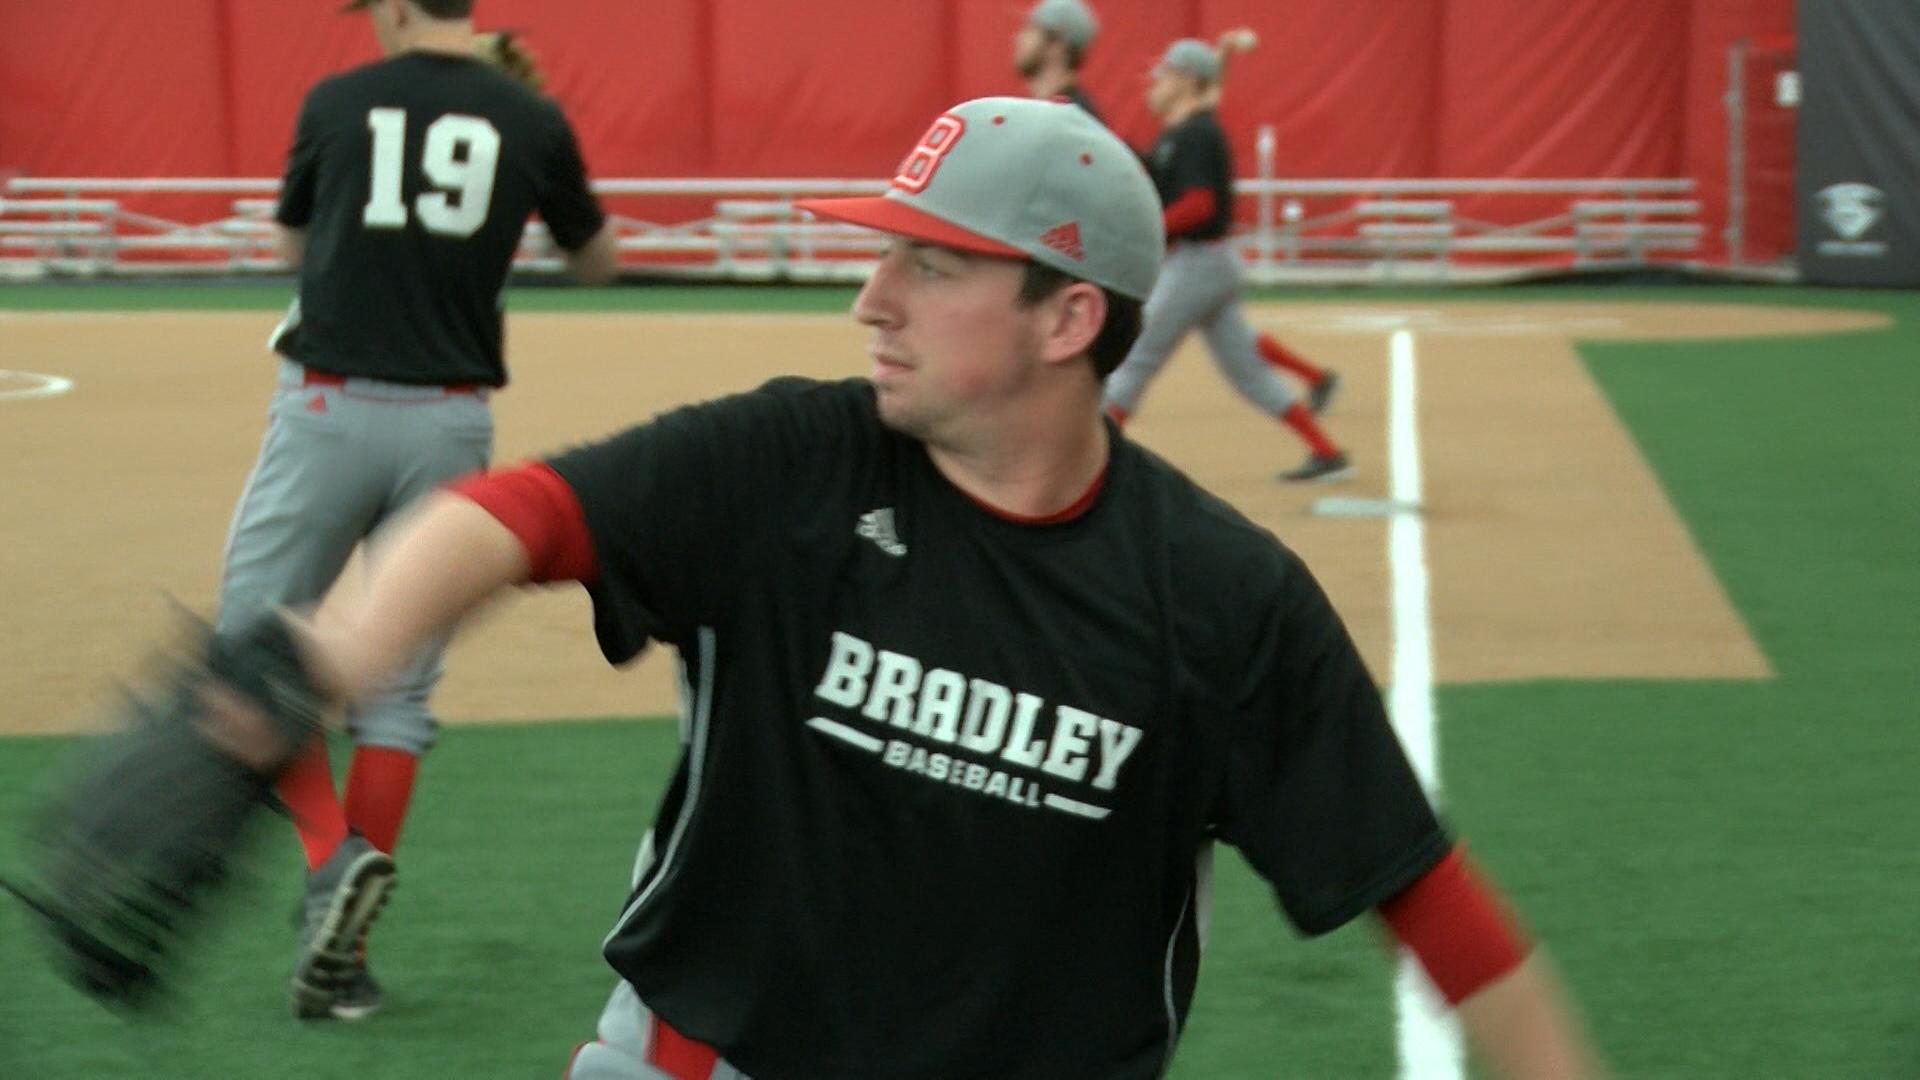 Cole Cook (Bradley baseball)_1490918320071.jpg